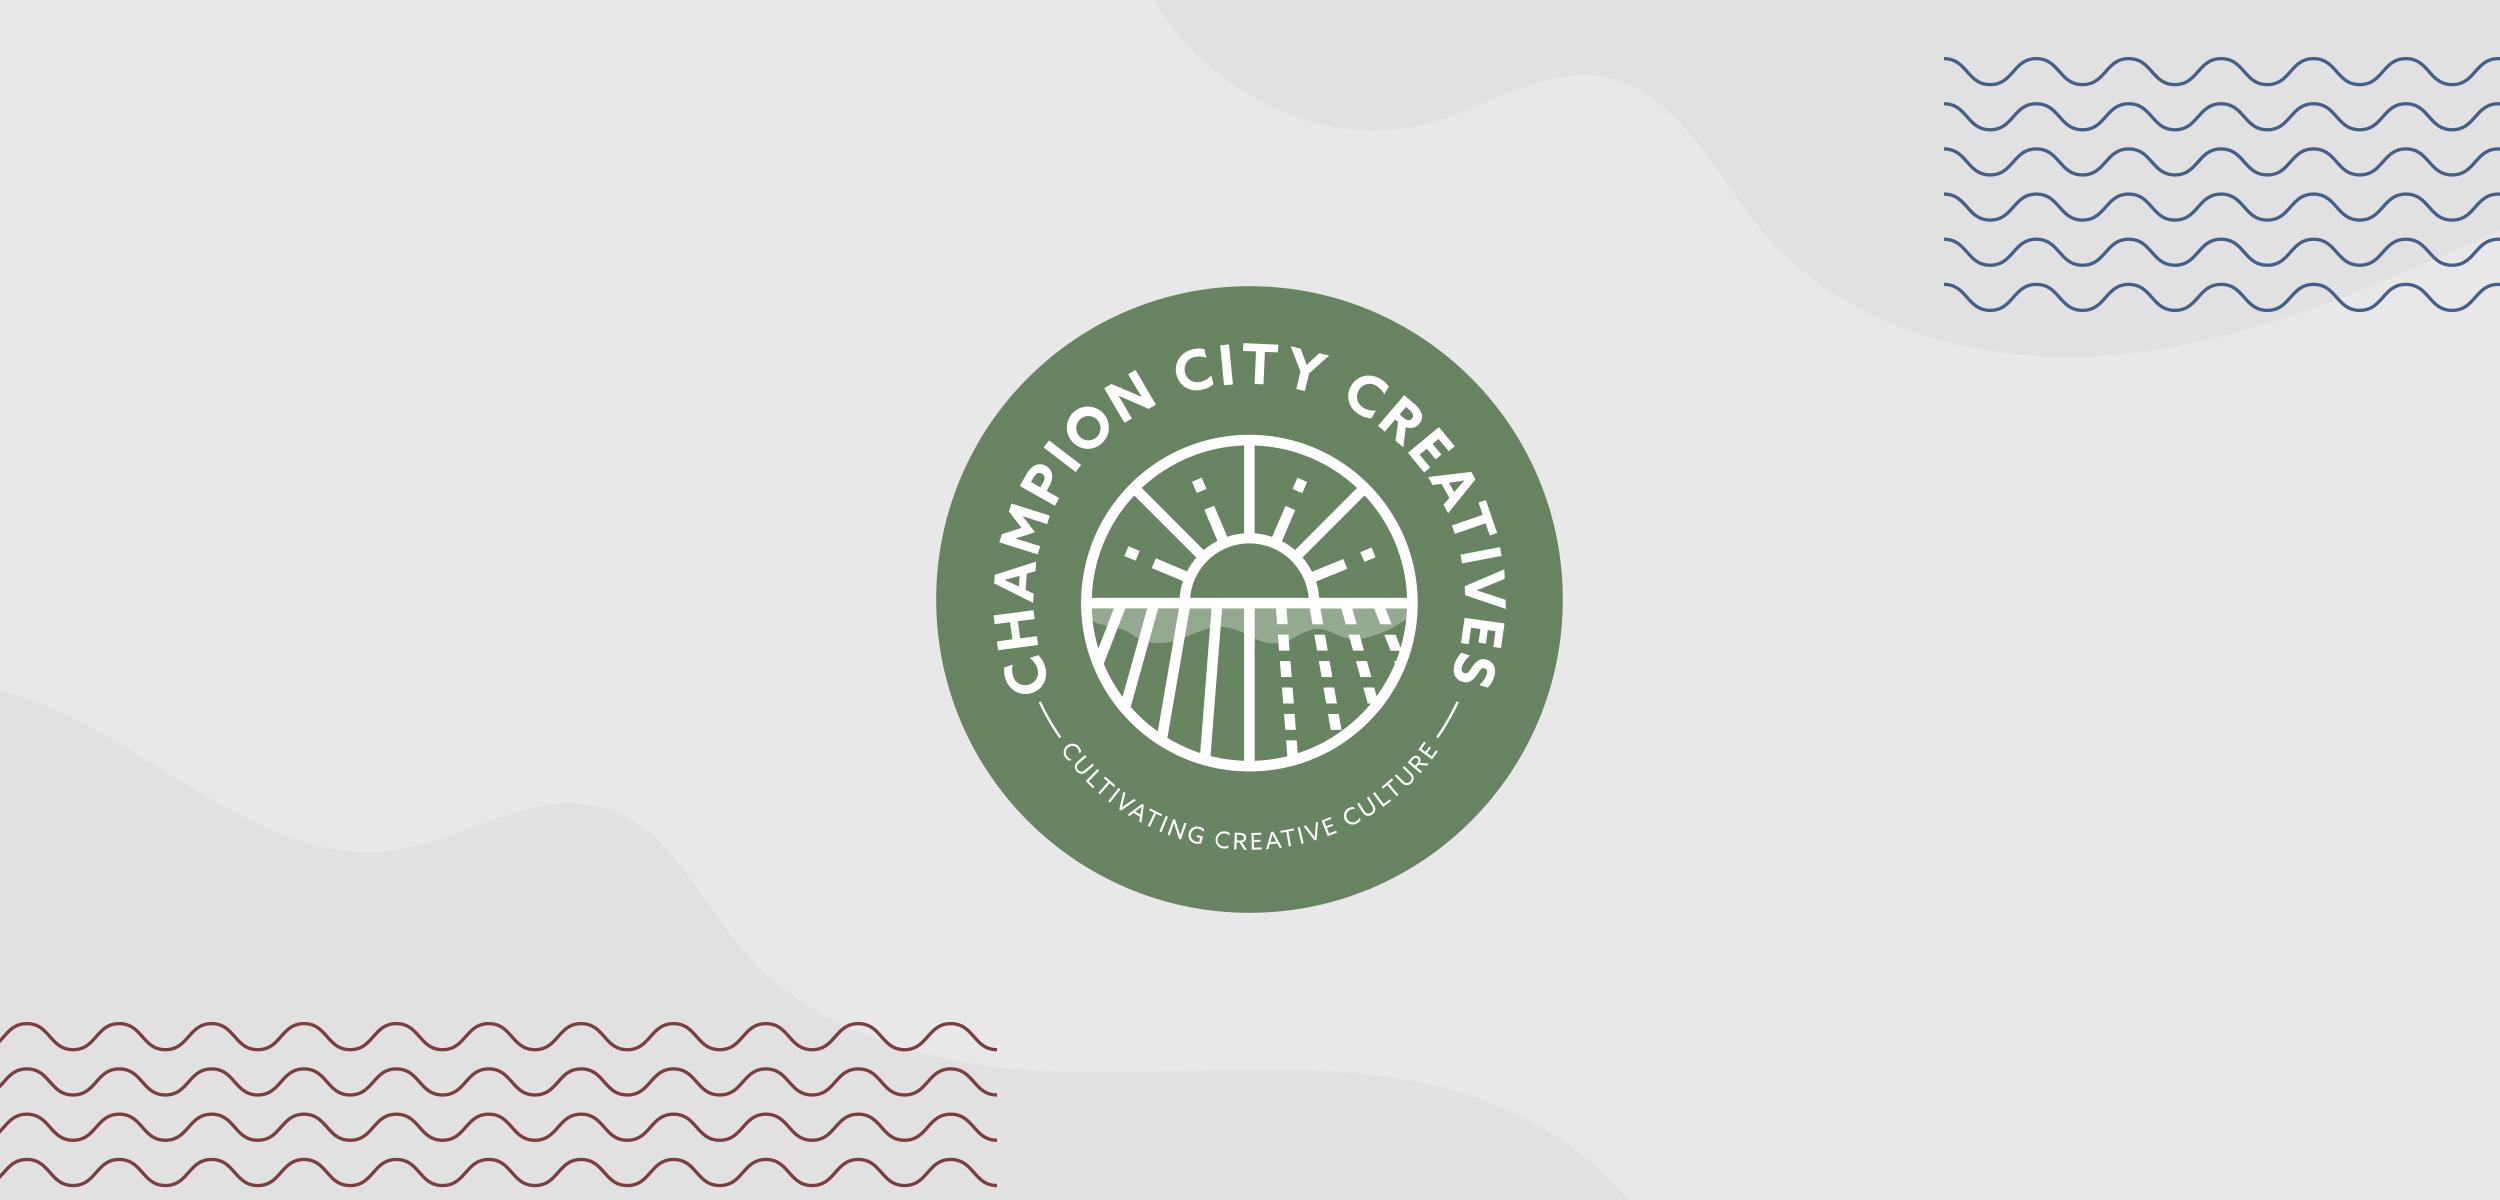 Champion-City-Creatives-Logo.jpg